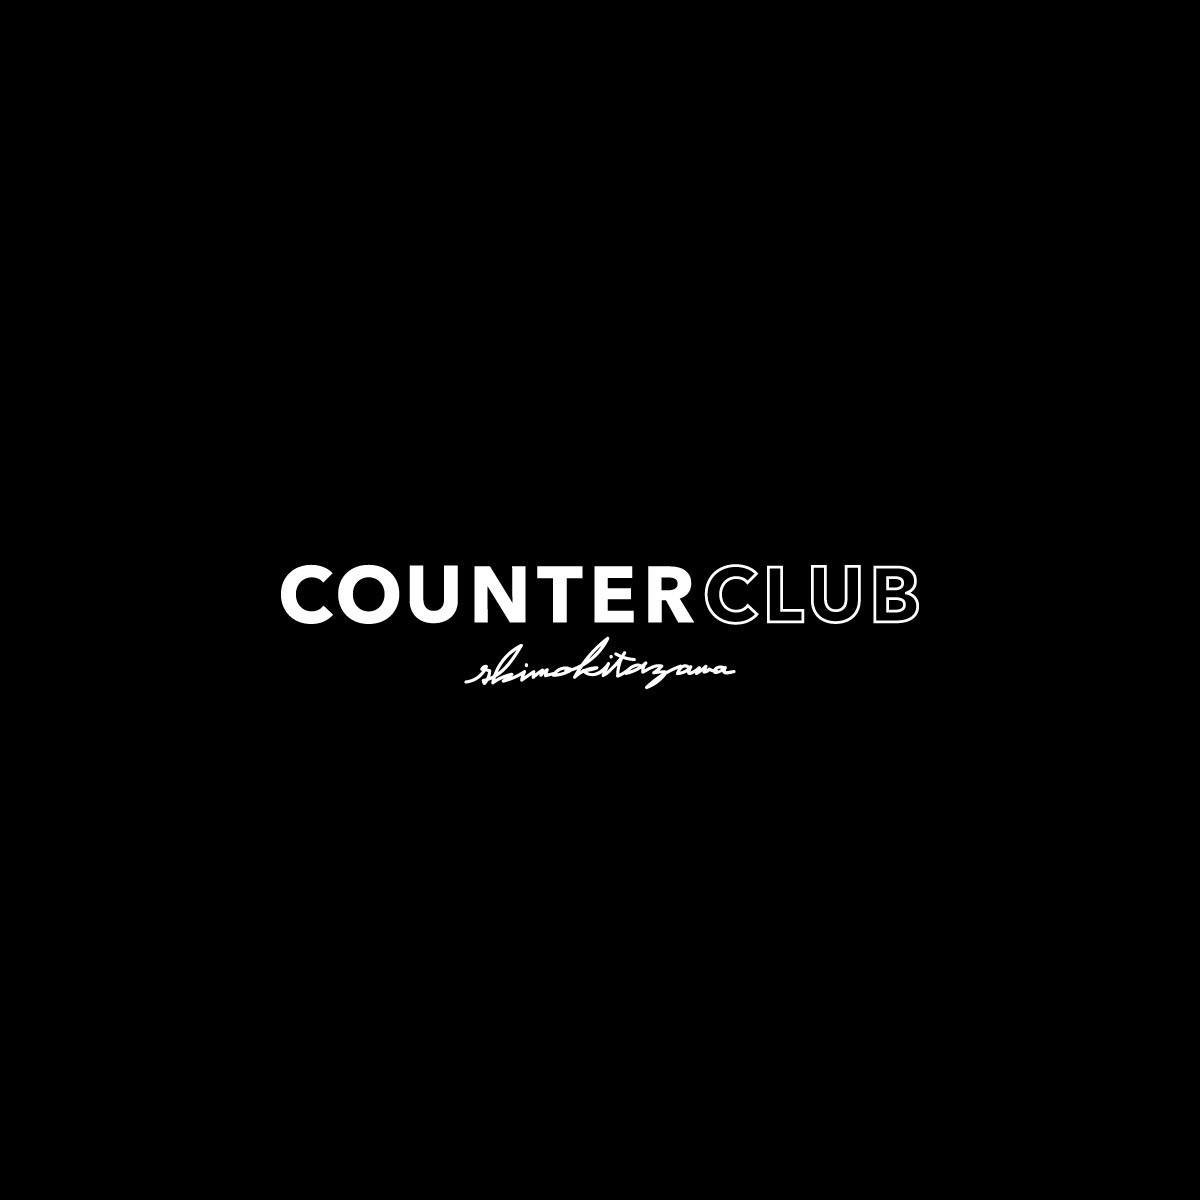 COUNTER CLUB